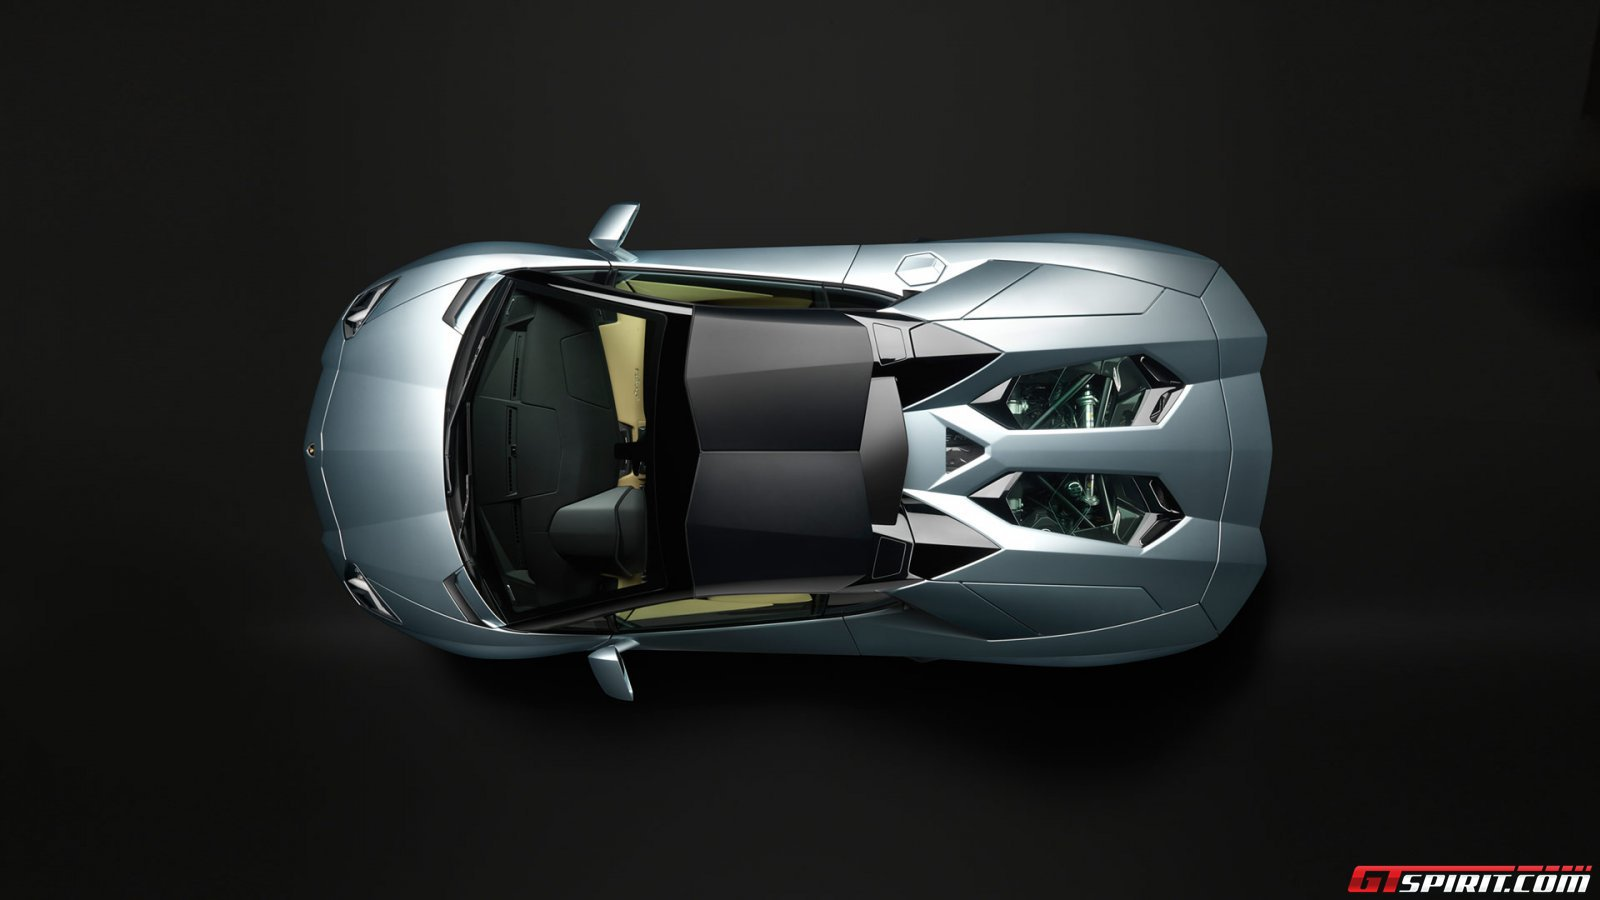 2013 Lamborghini Aventador LP700-4 Roadster Photo 3